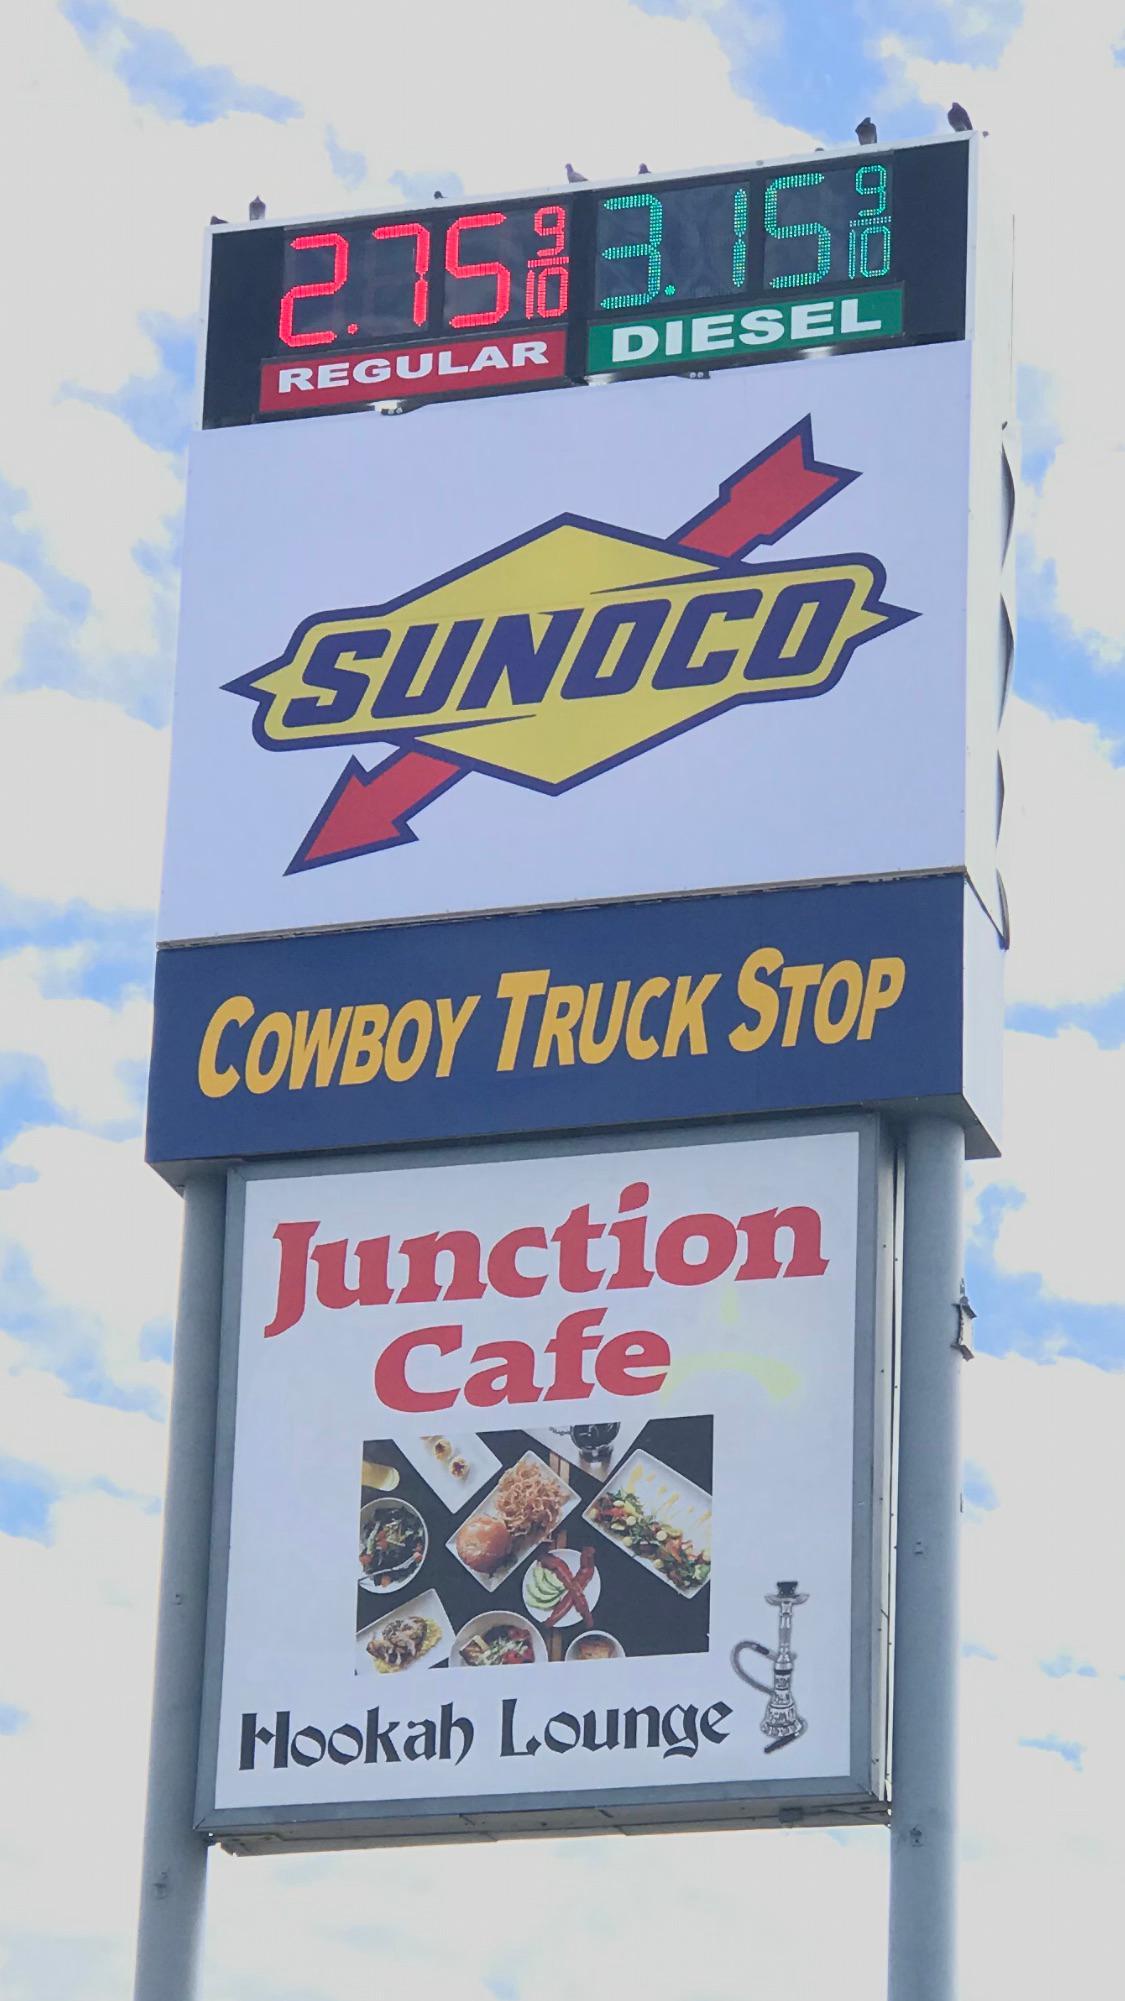 CowBoy Truck Stop - Sunoco image 3